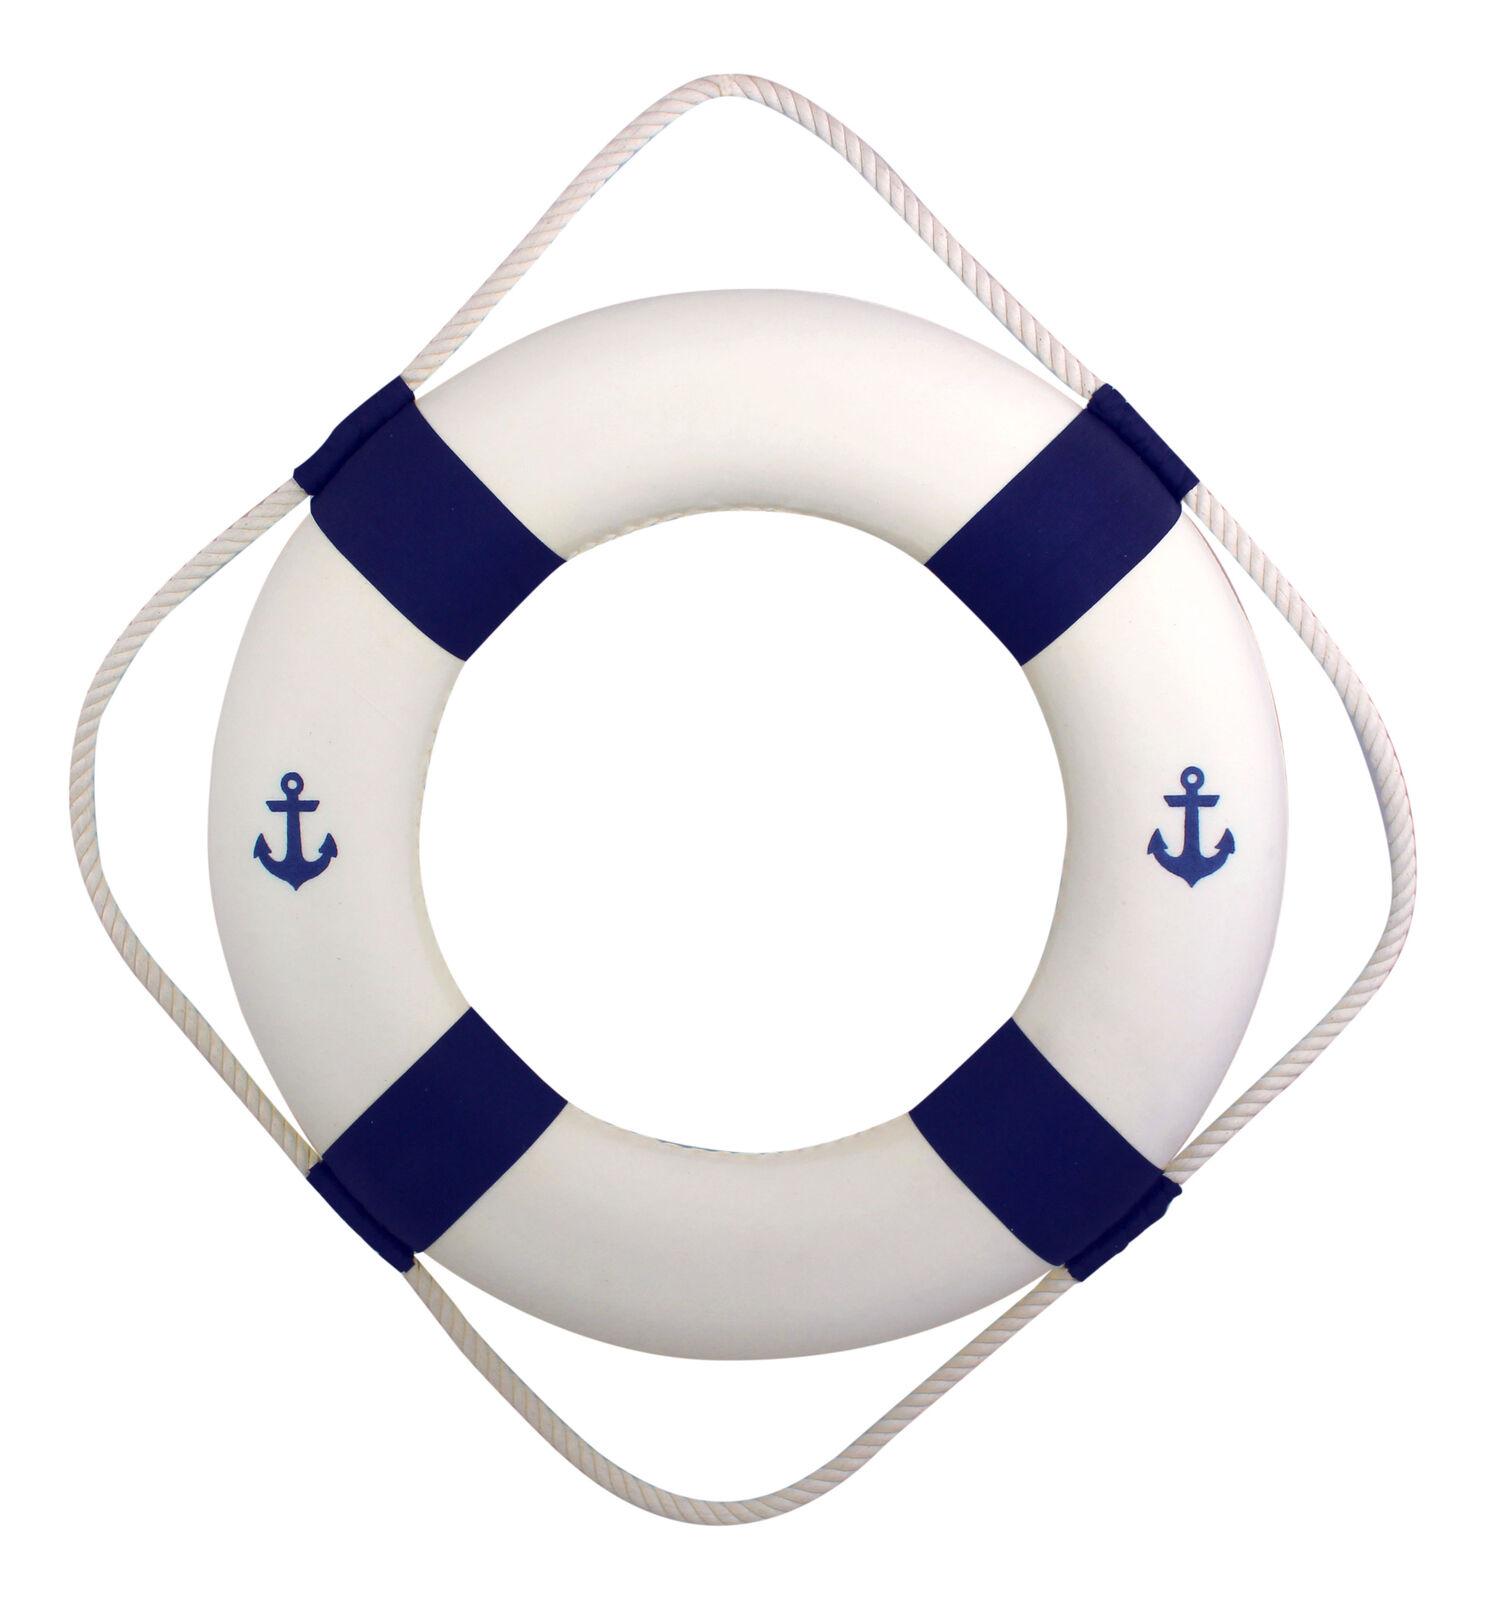 картинки кругов для моряков мчс